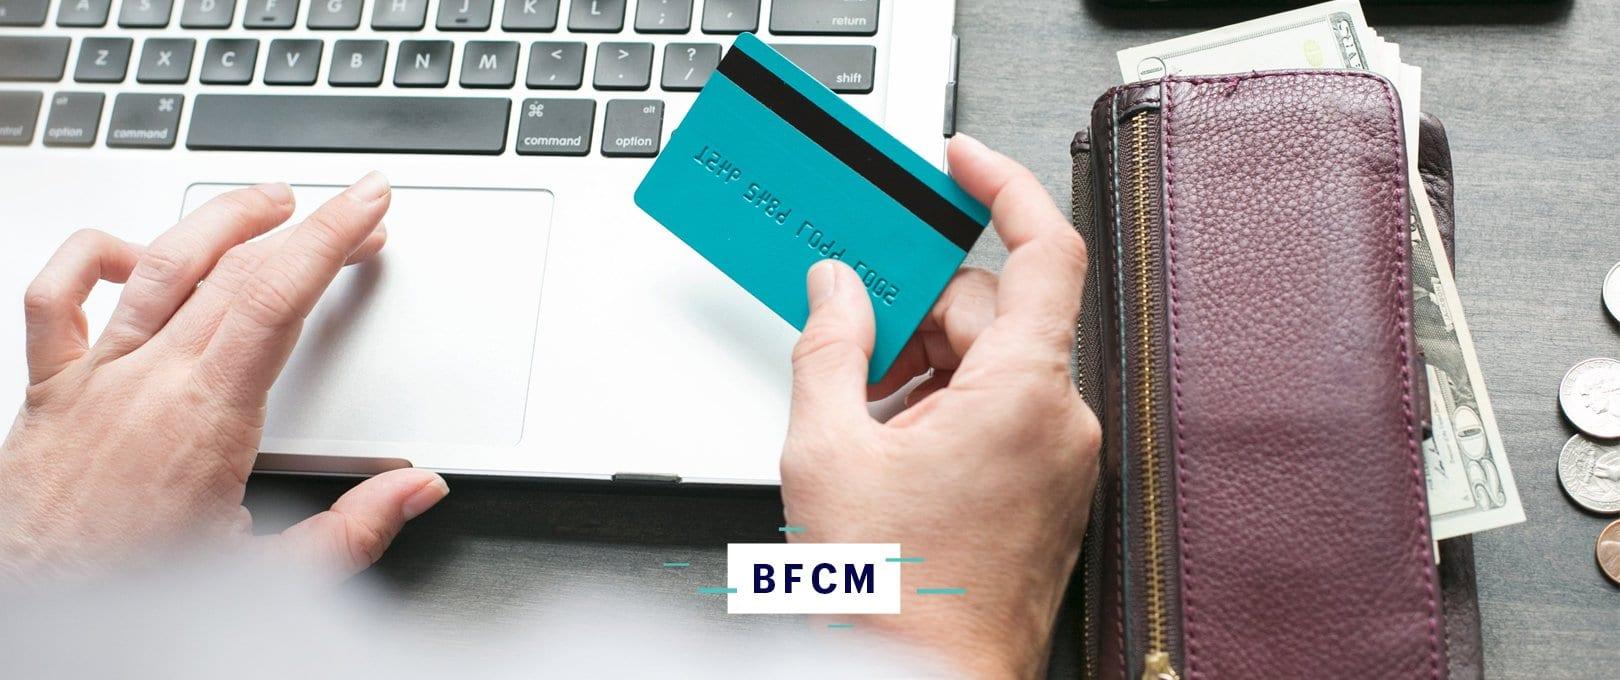 BFCM_hero_Financing_ART.jpg